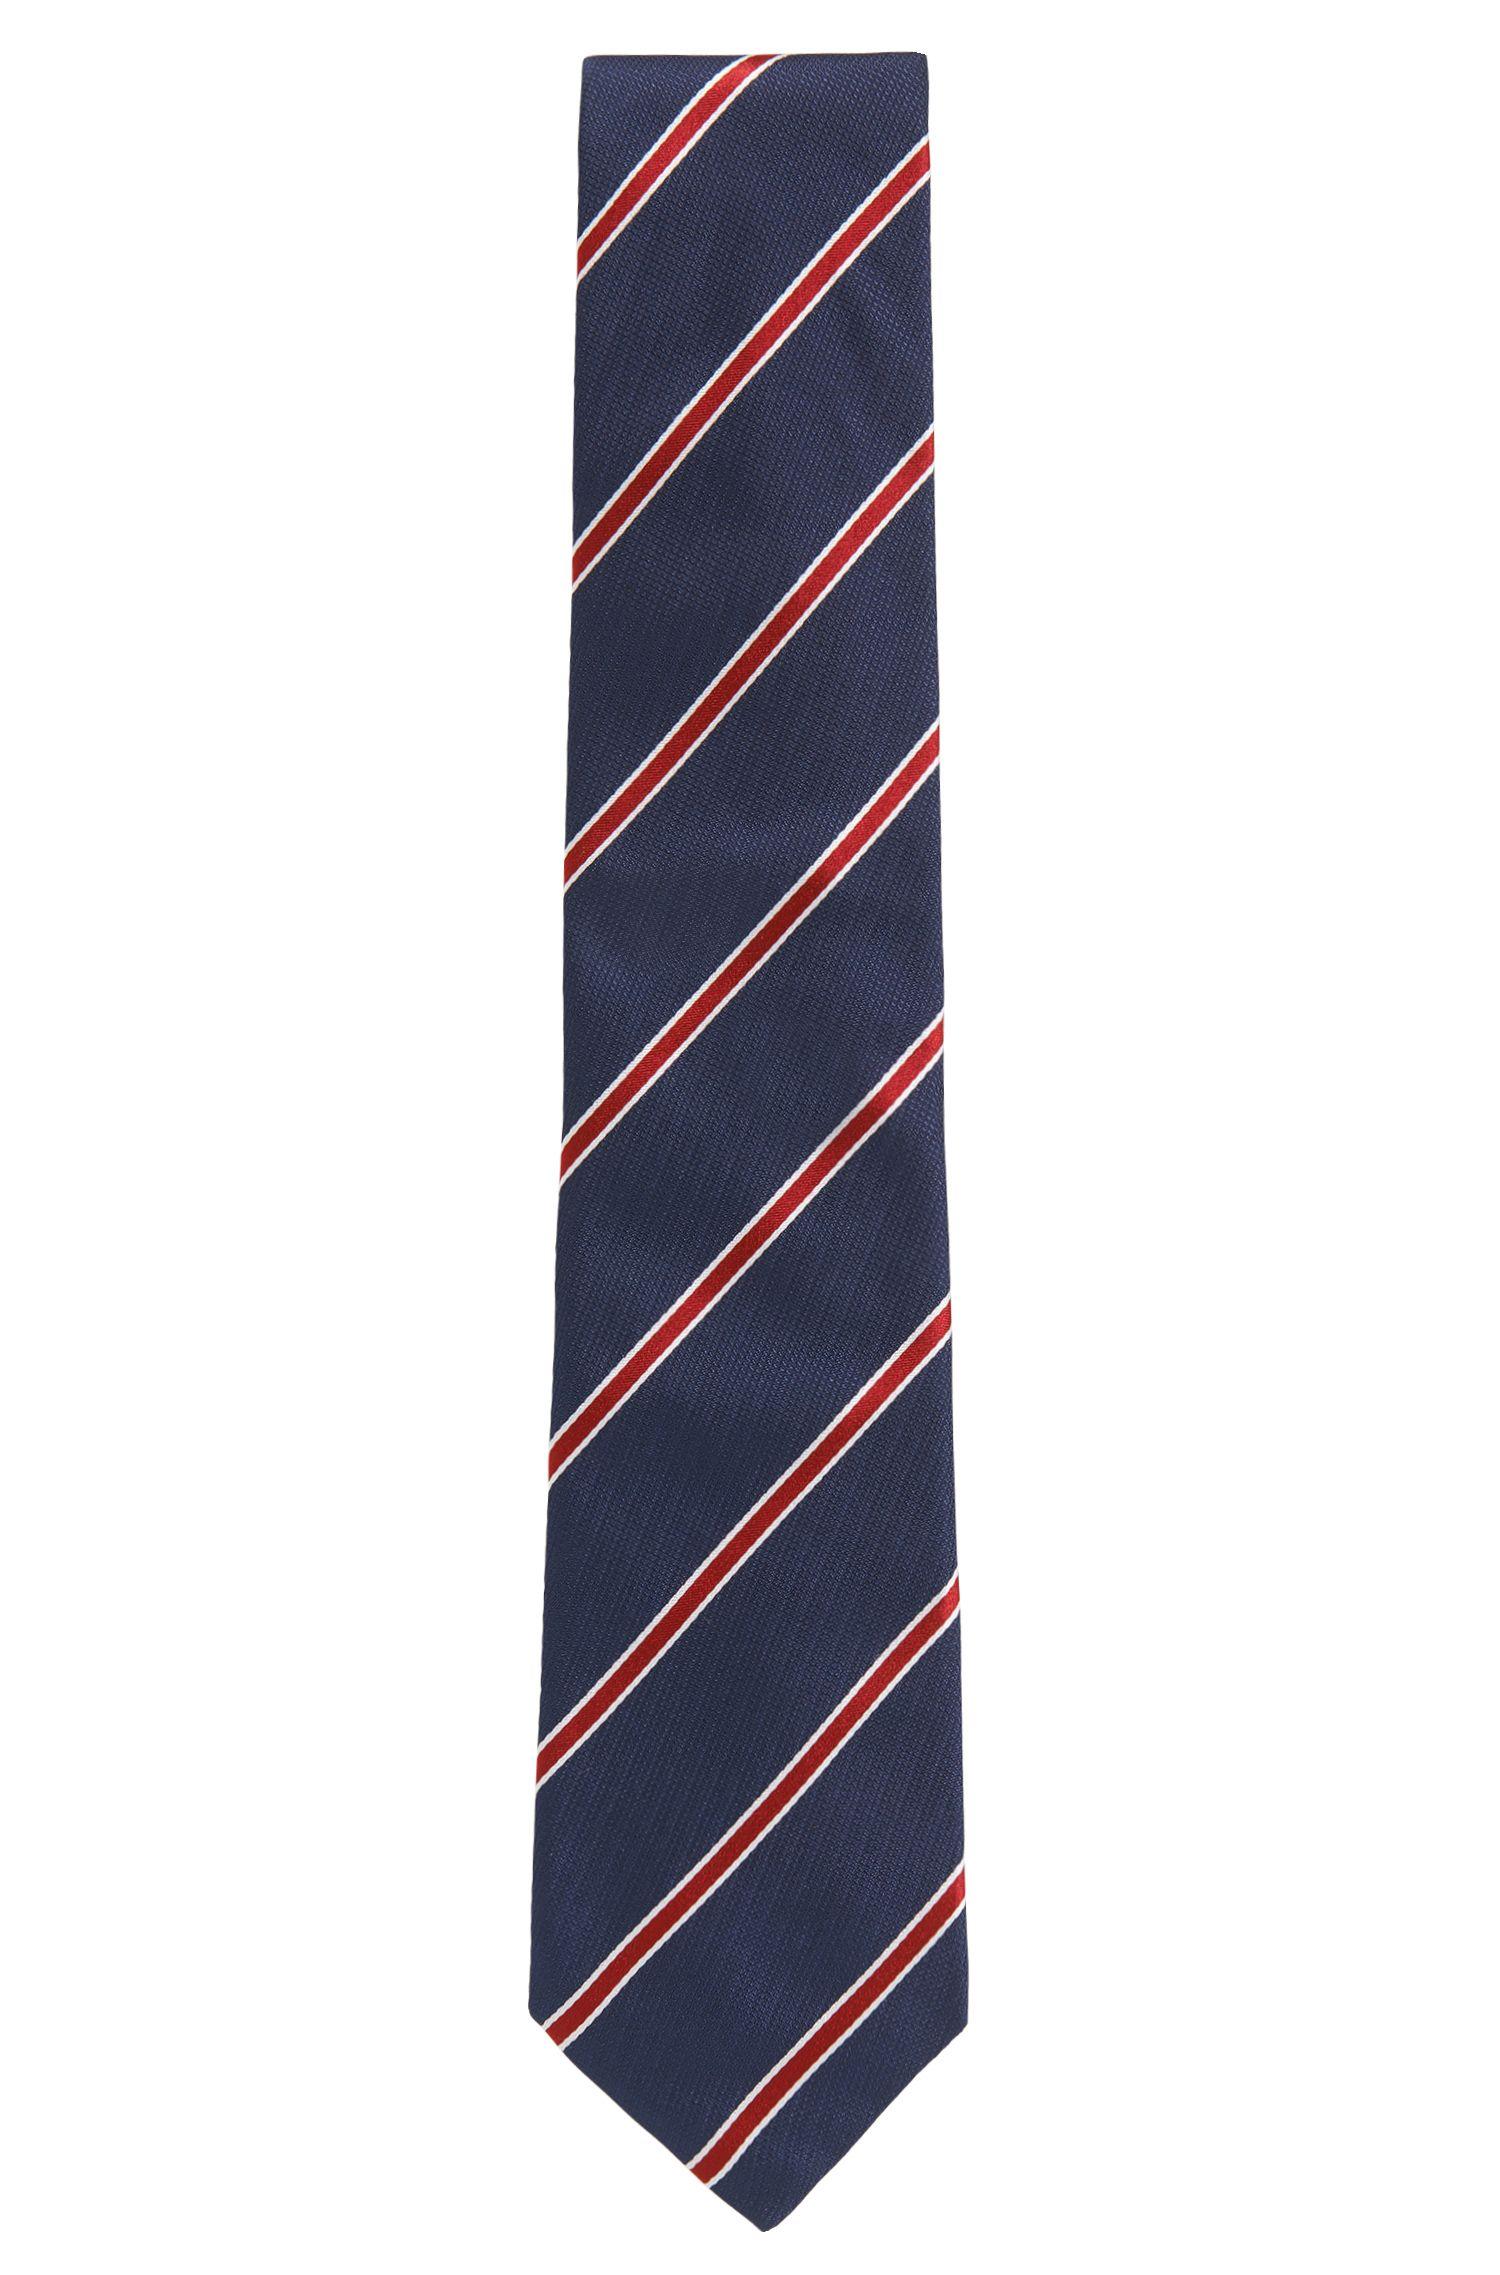 Yarn-dyed diagonal striped tie in silk jacquard